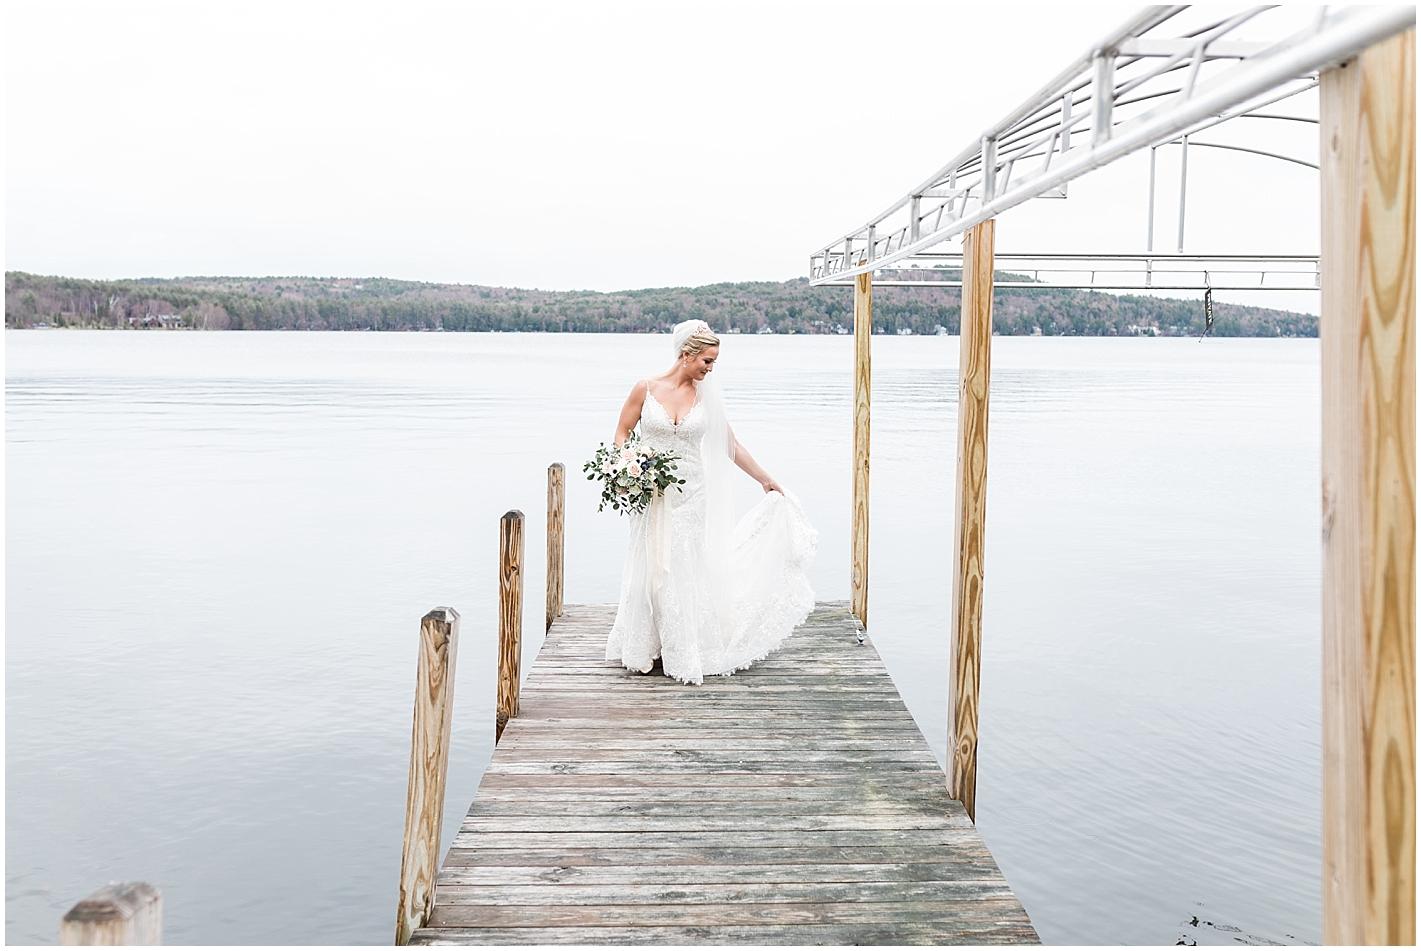 Lake winnipesaukee Wedding Photos by Alyssa Parker Photography